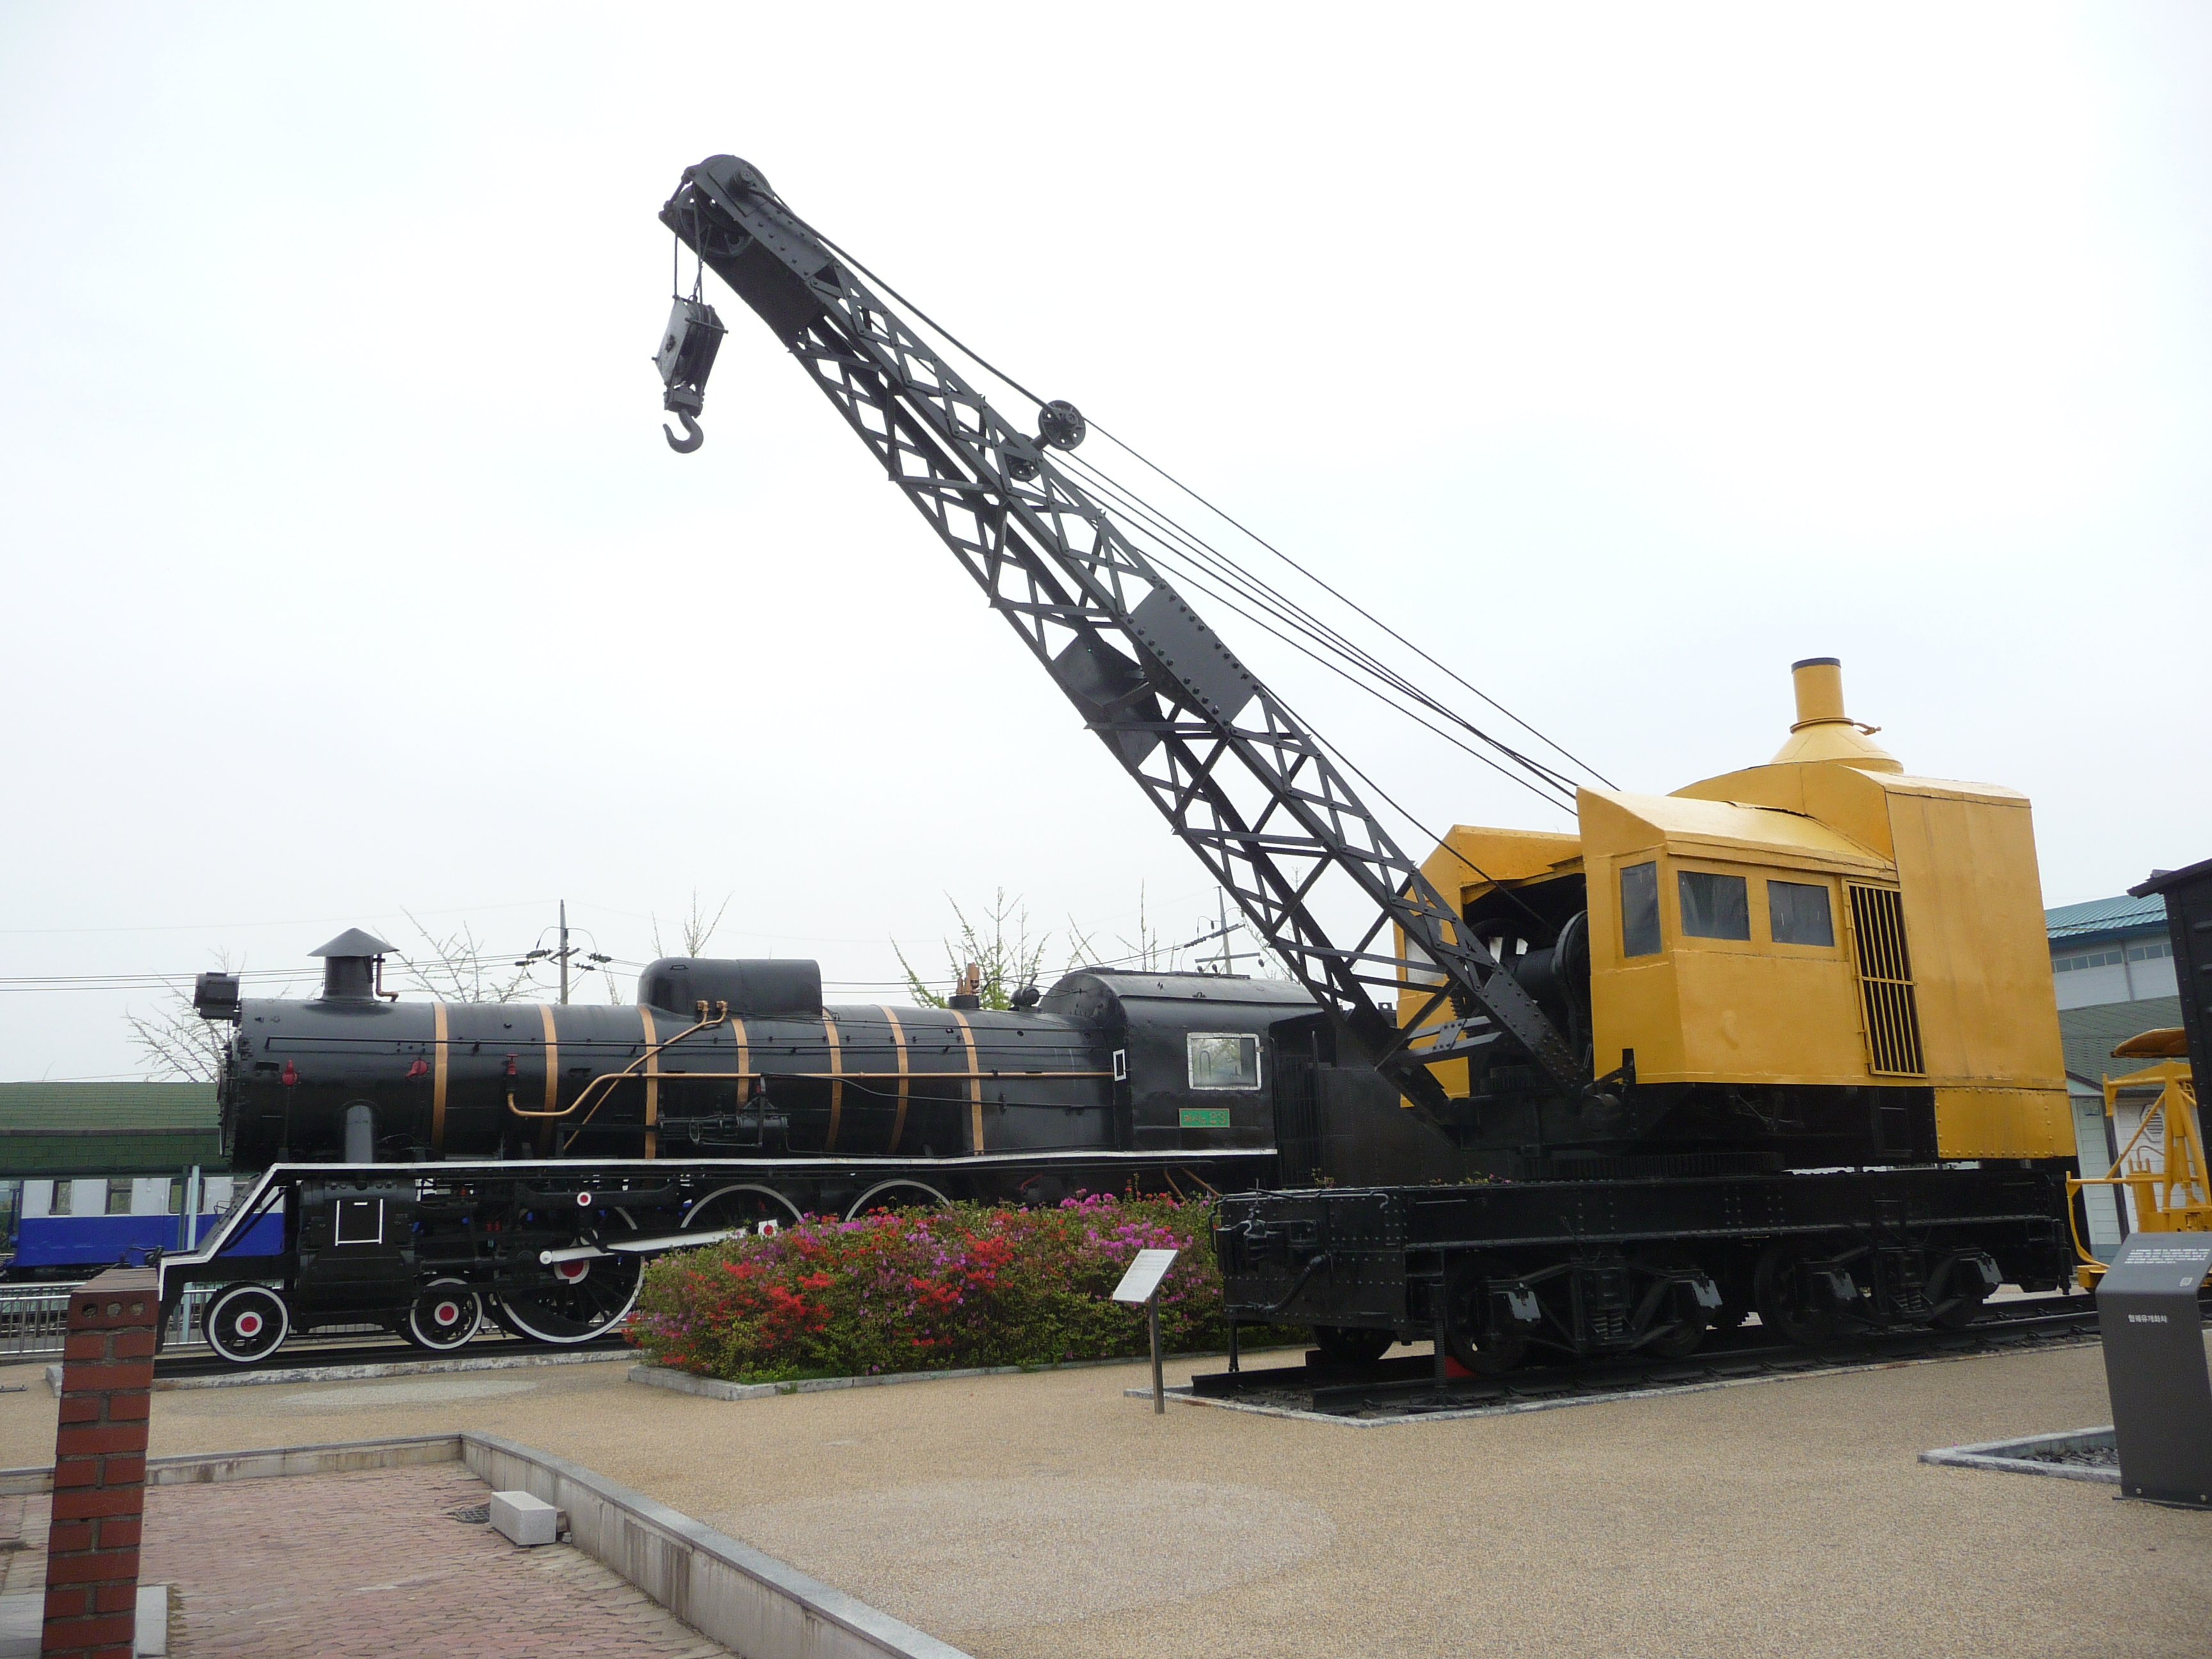 Build Your Own Car >> File:Korean railway crane.JPG - Wikimedia Commons